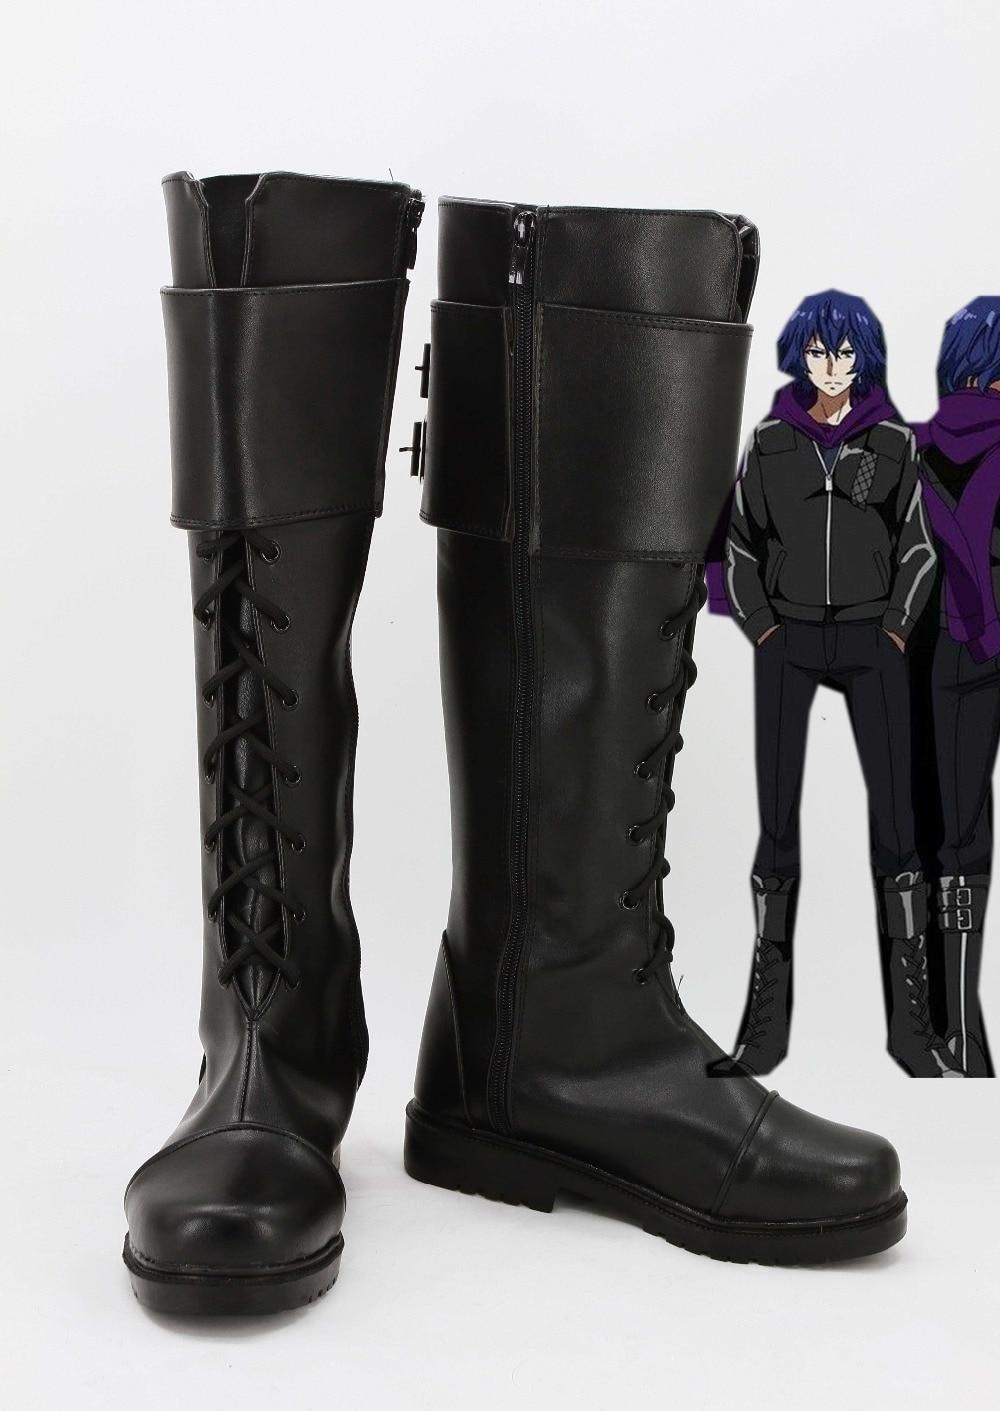 Tokyo Ghoul Kirishima Ayato Black Cosplay Shoes Boots For Christmas Halloween For Men Women